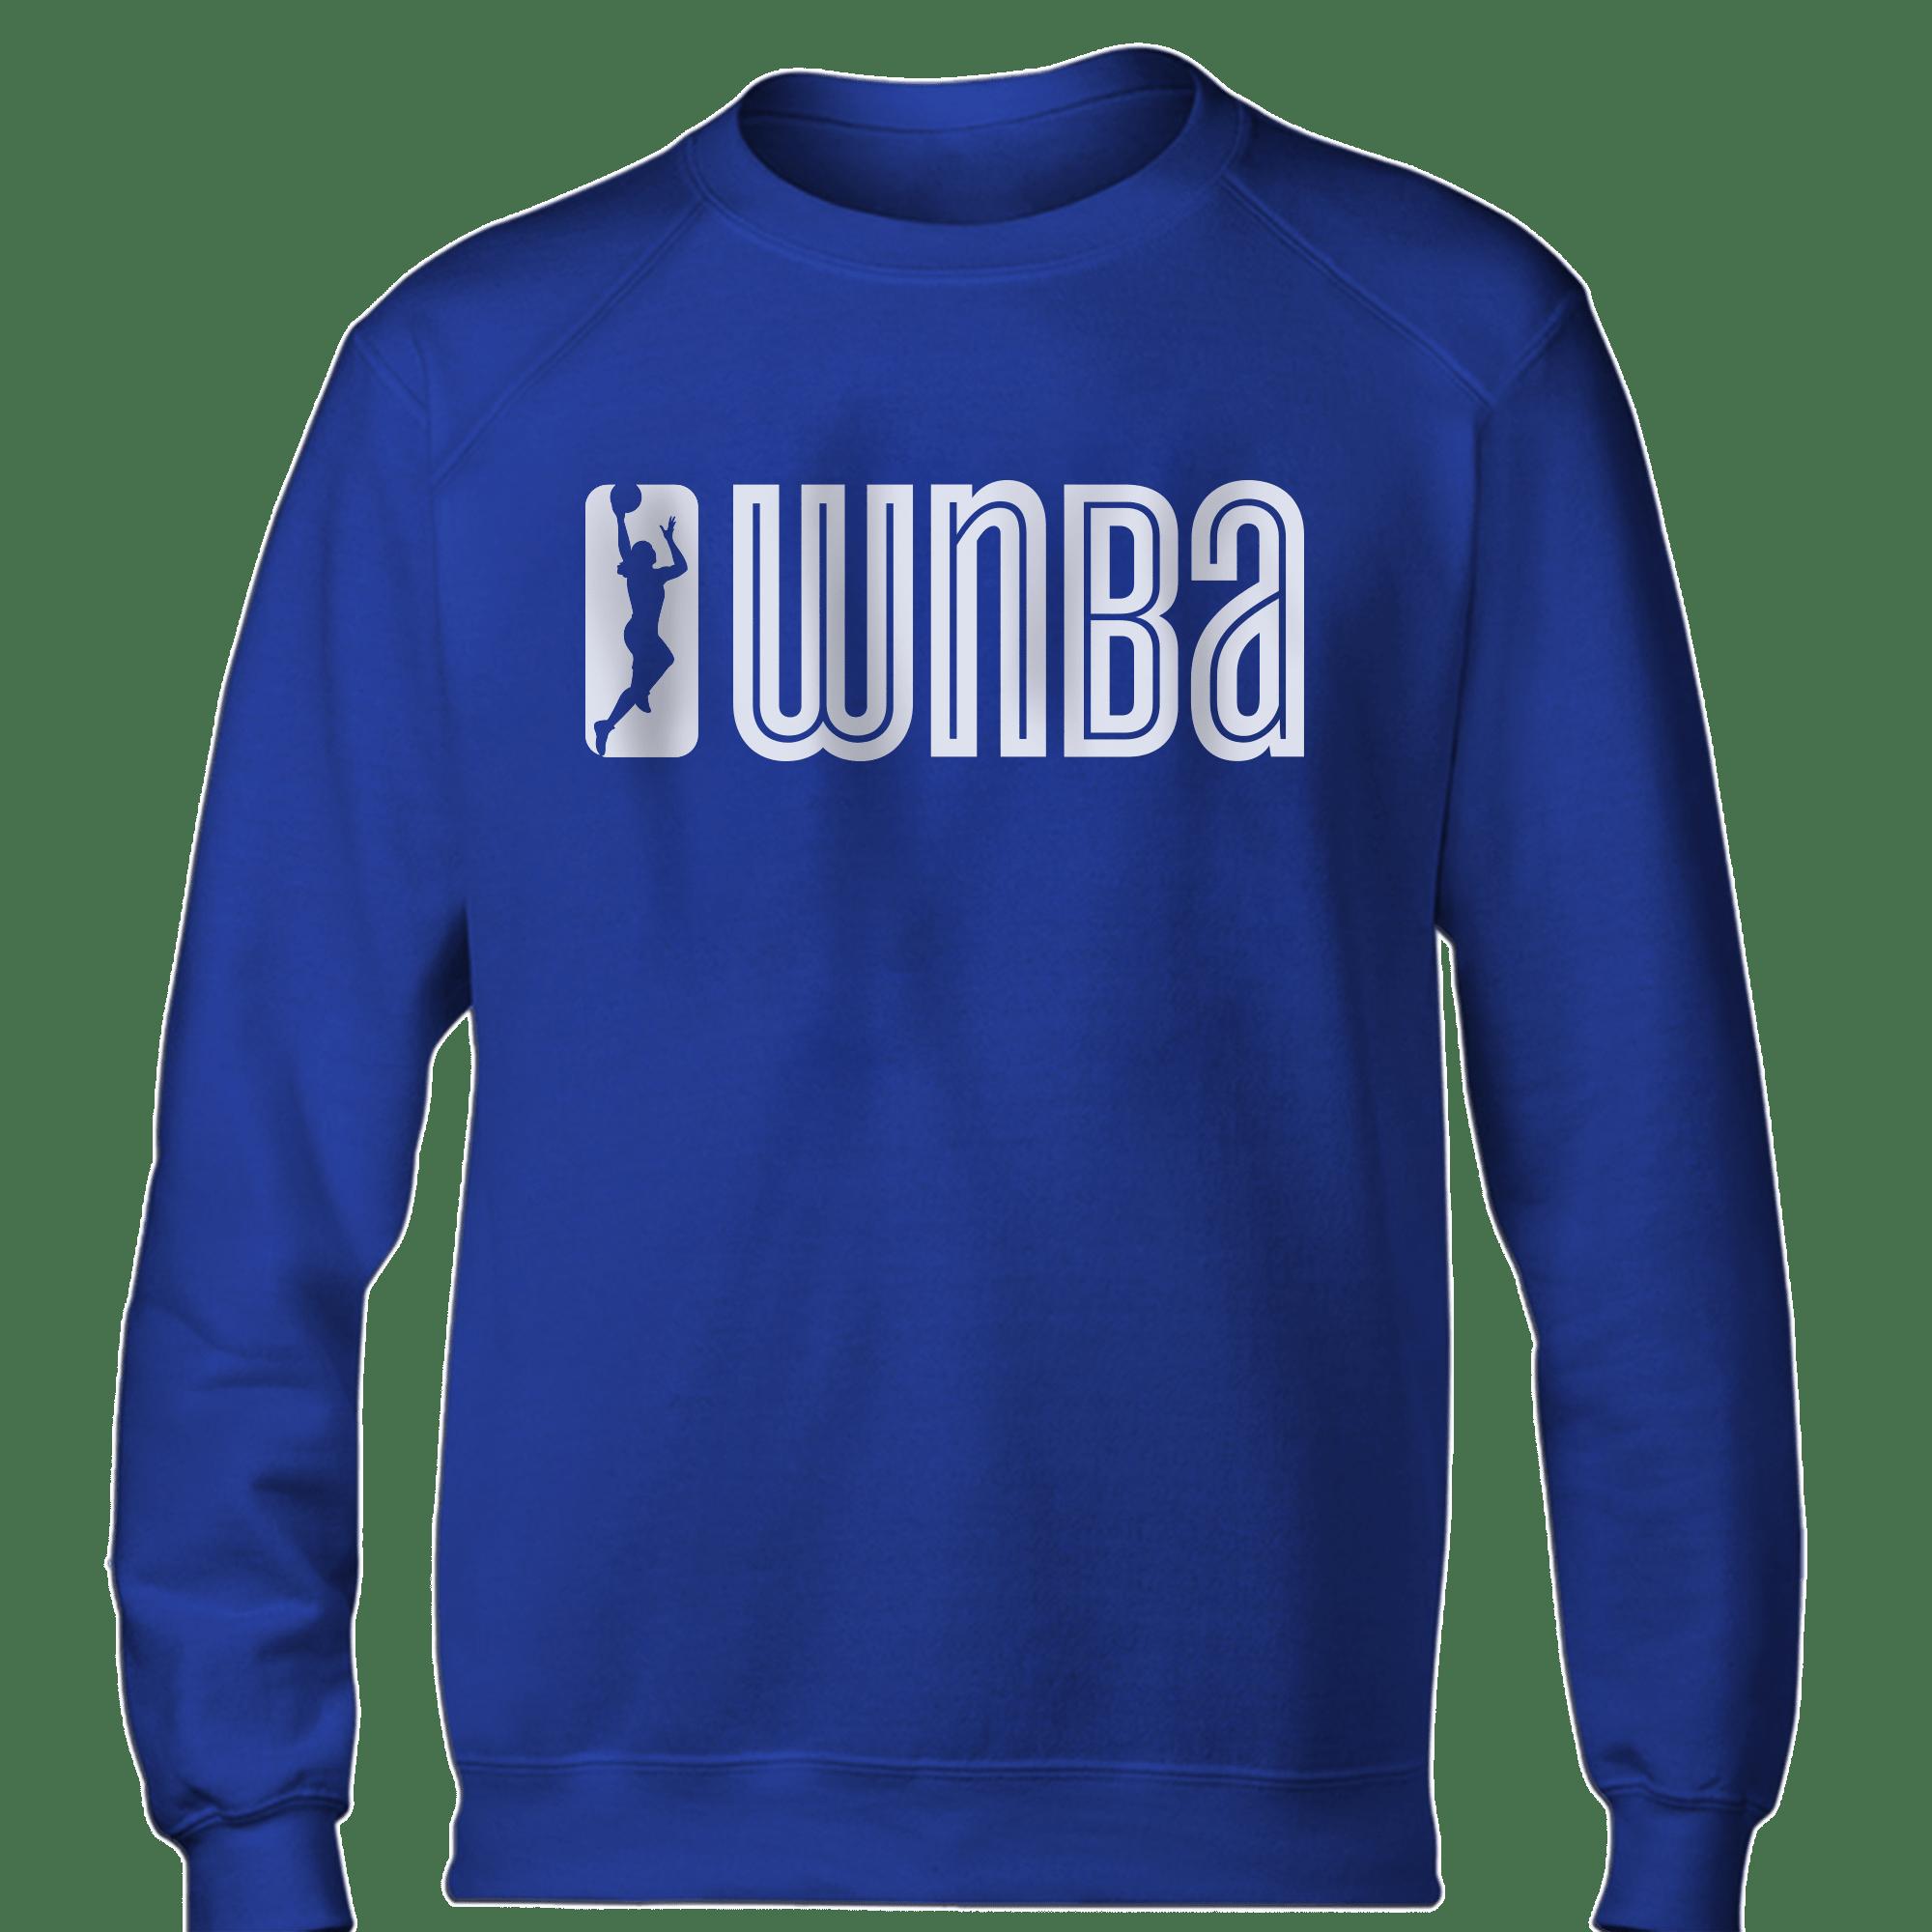 WNBA Basic (BSC-BLU-NP-WNBA-633)